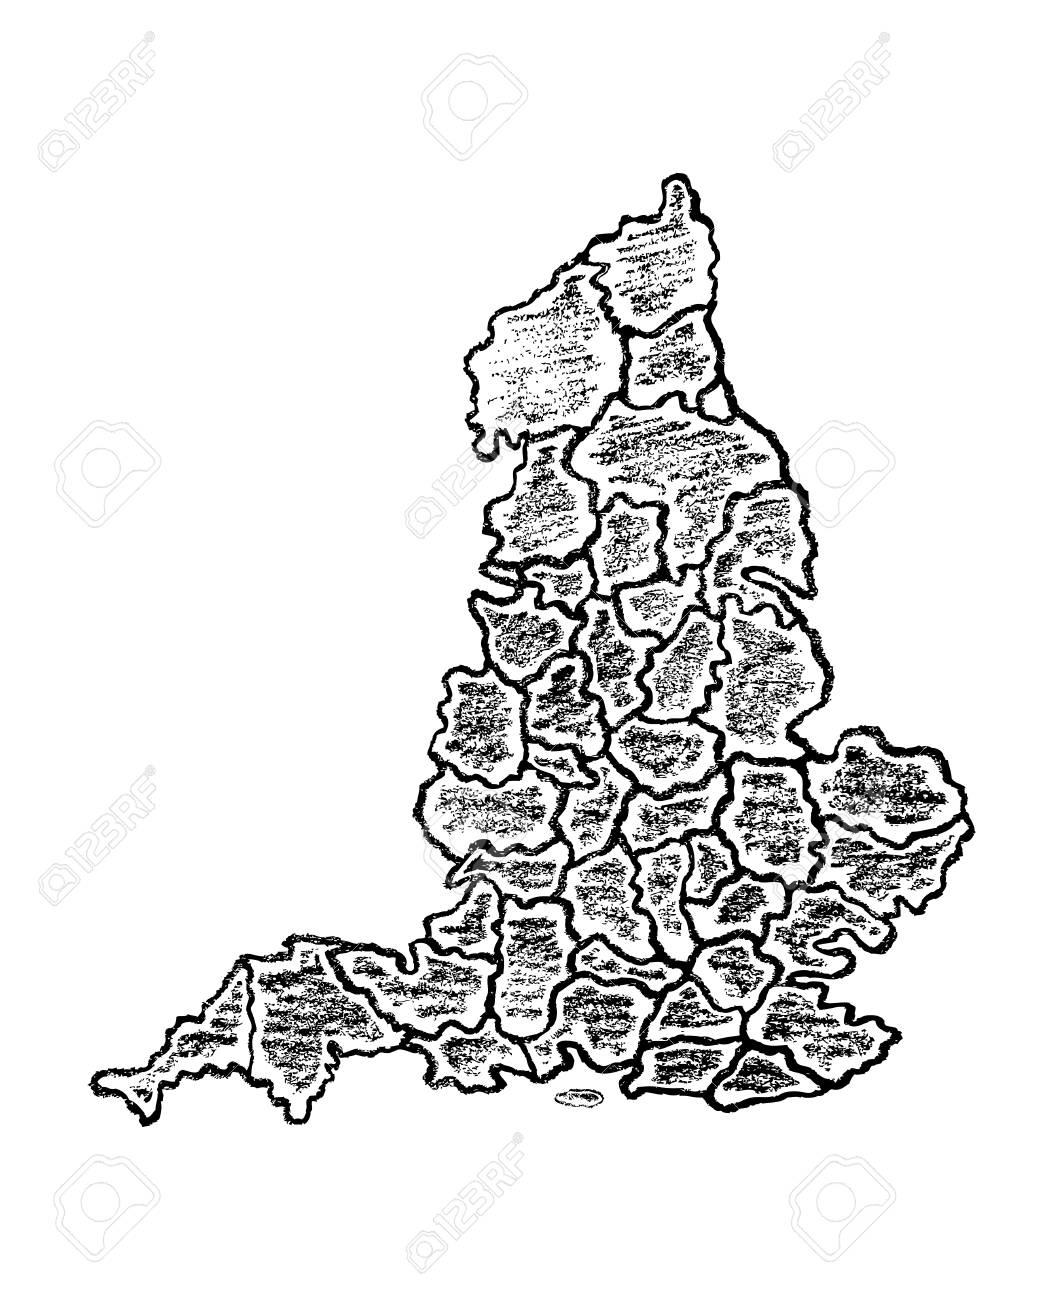 Map Of Uk Black And White.Stock Illustration